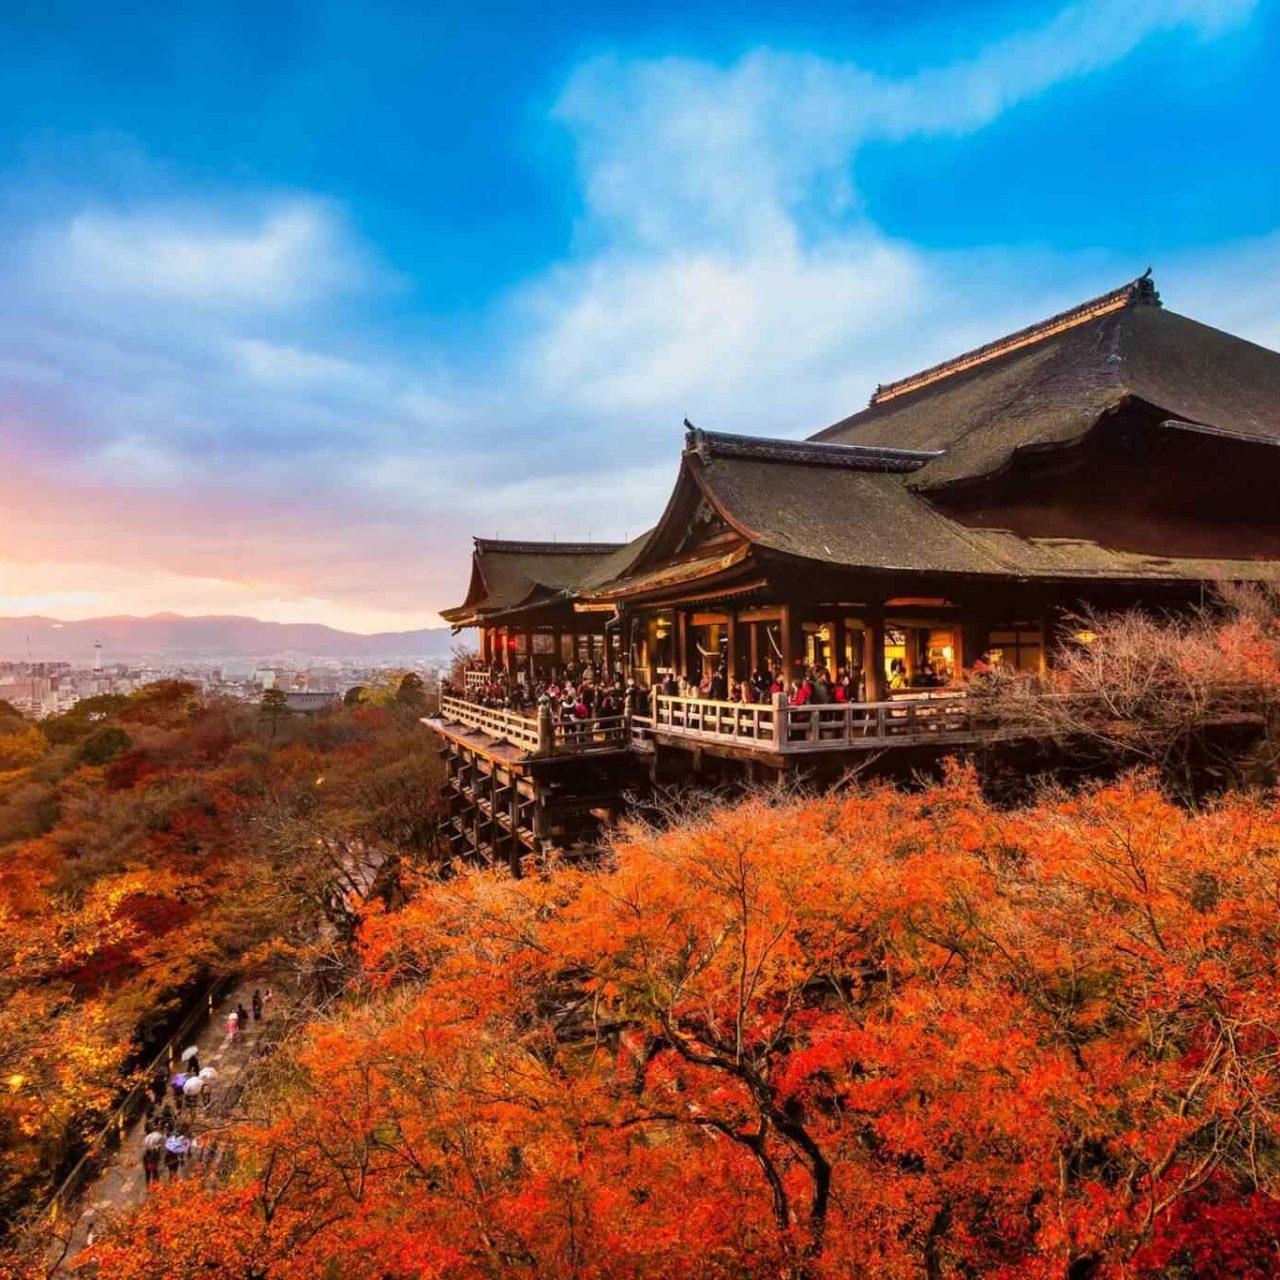 https://tinatours.bg/wp-content/uploads/2018/09/destination-kyoto-01-1280x1280.jpg